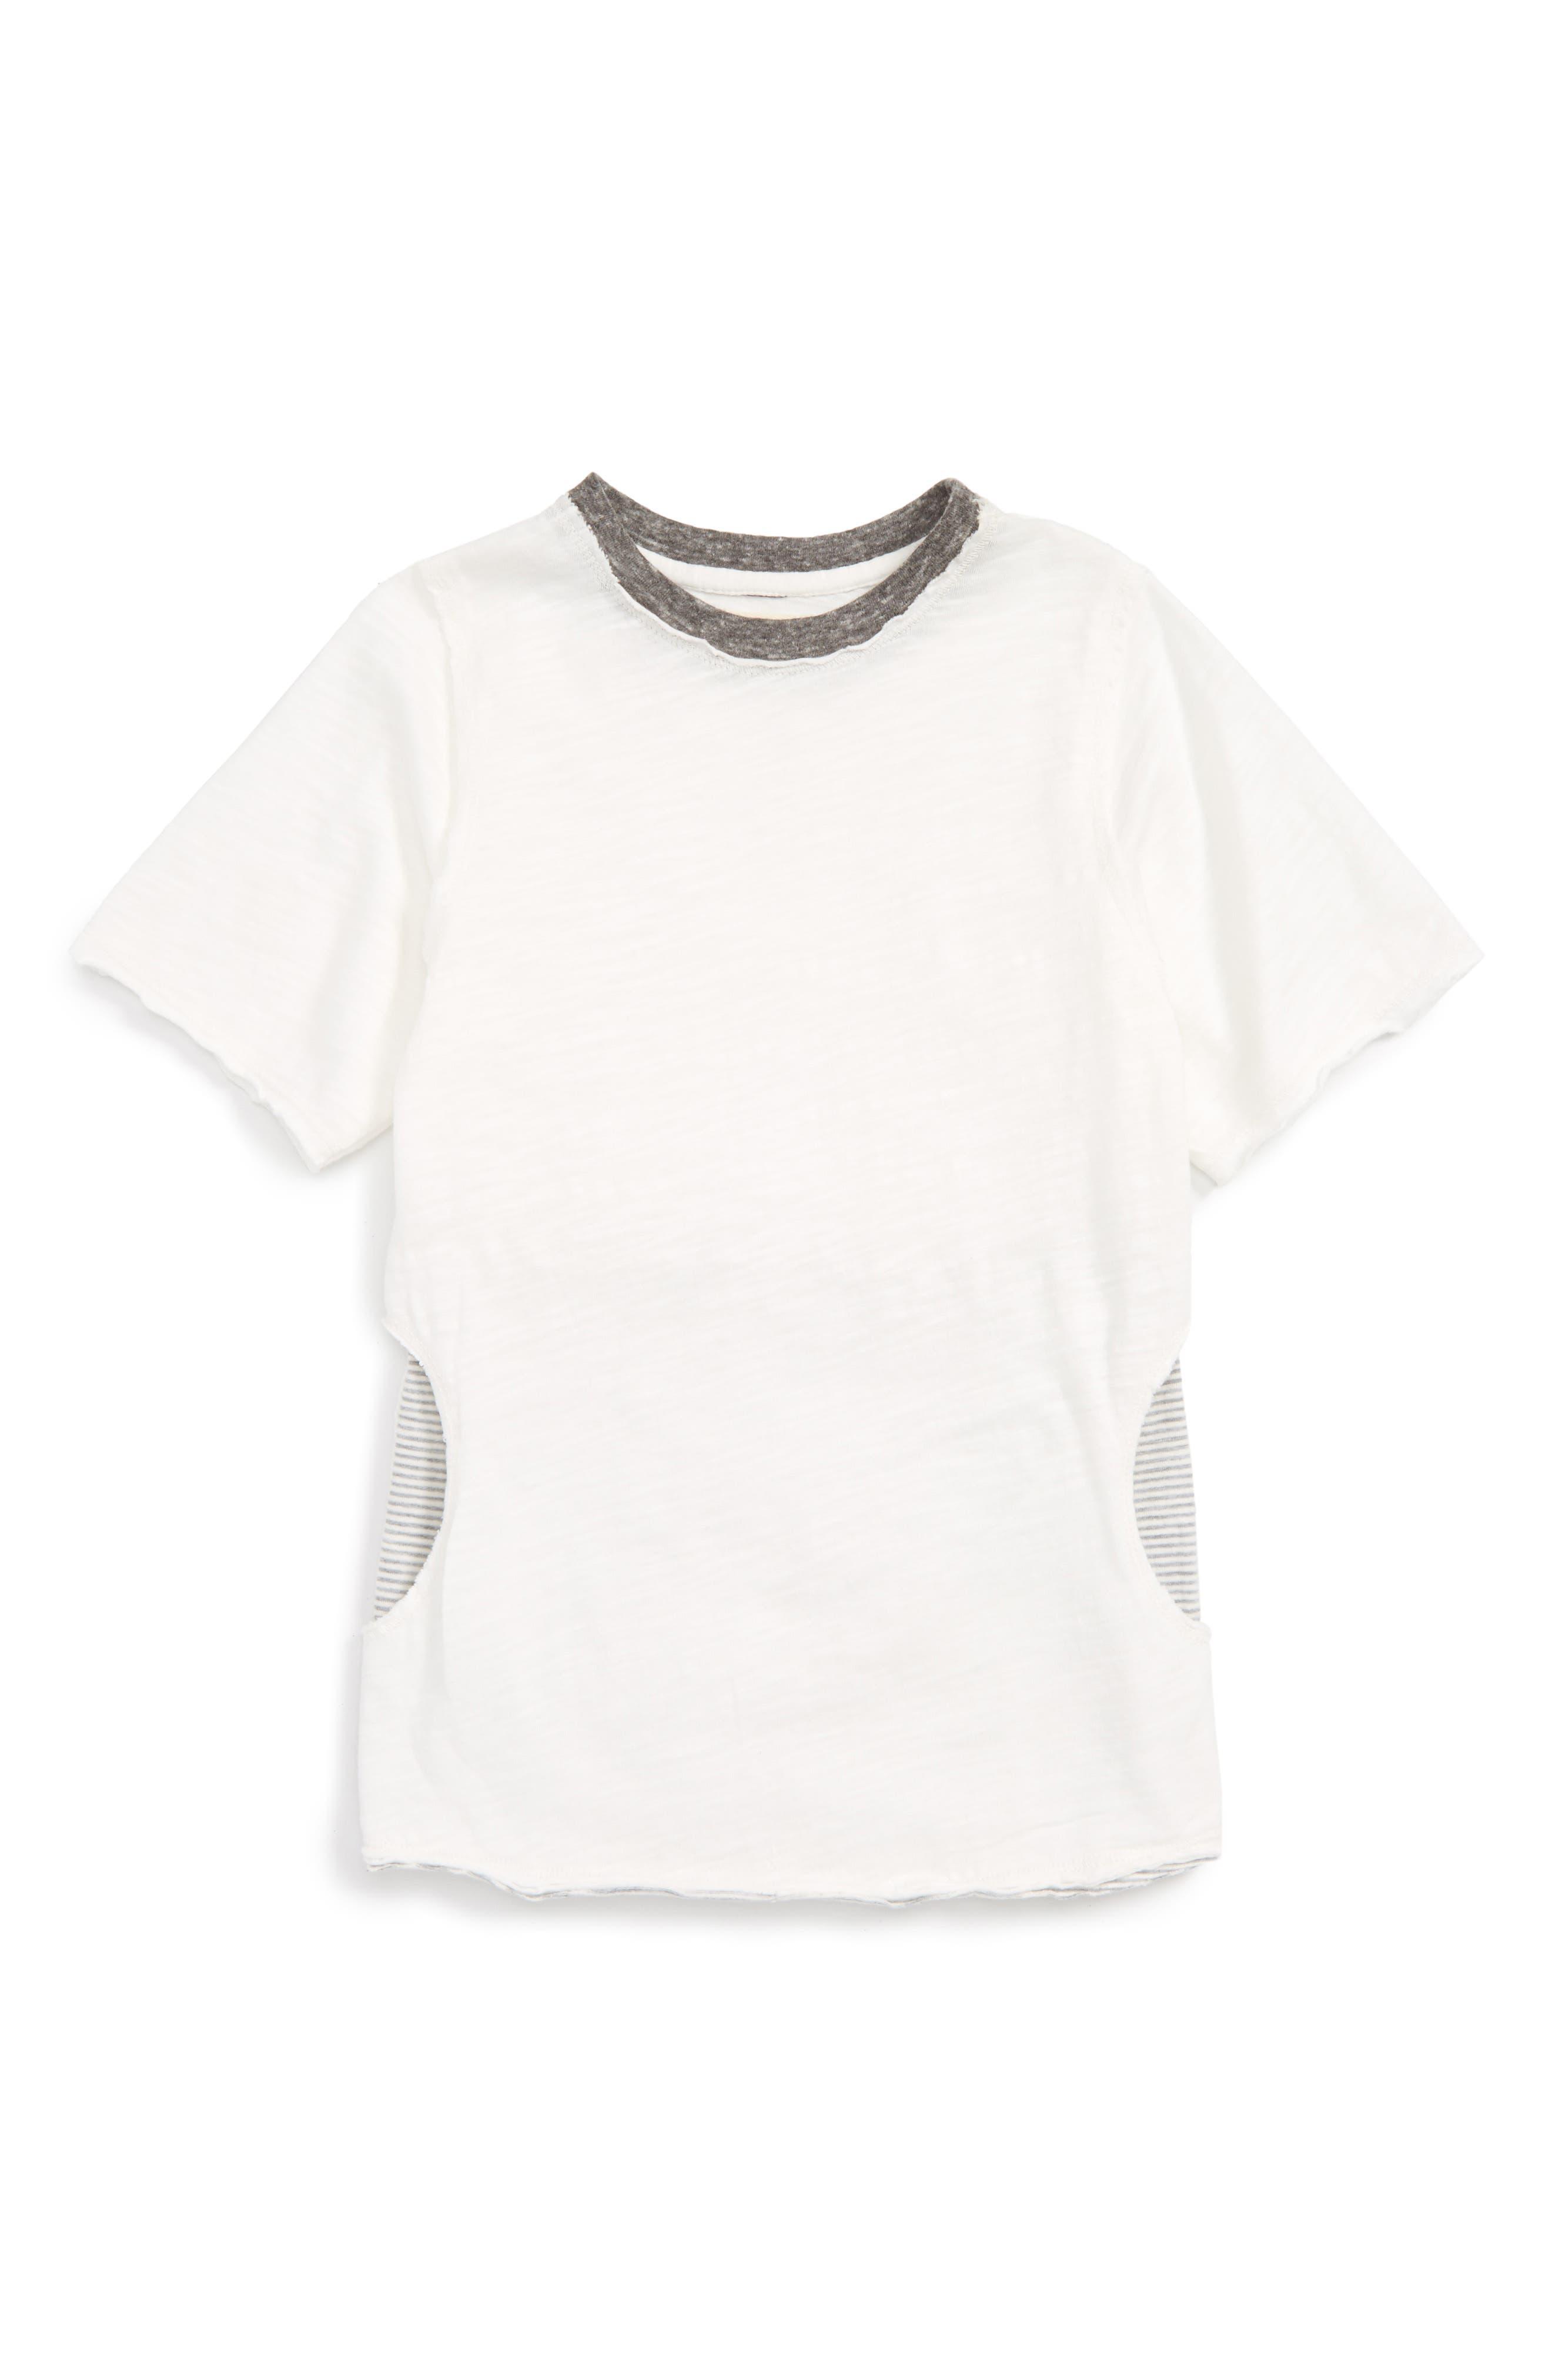 Miki Miette Reed T-Shirt (Toddler Boys, Little Boys & Big Boys)